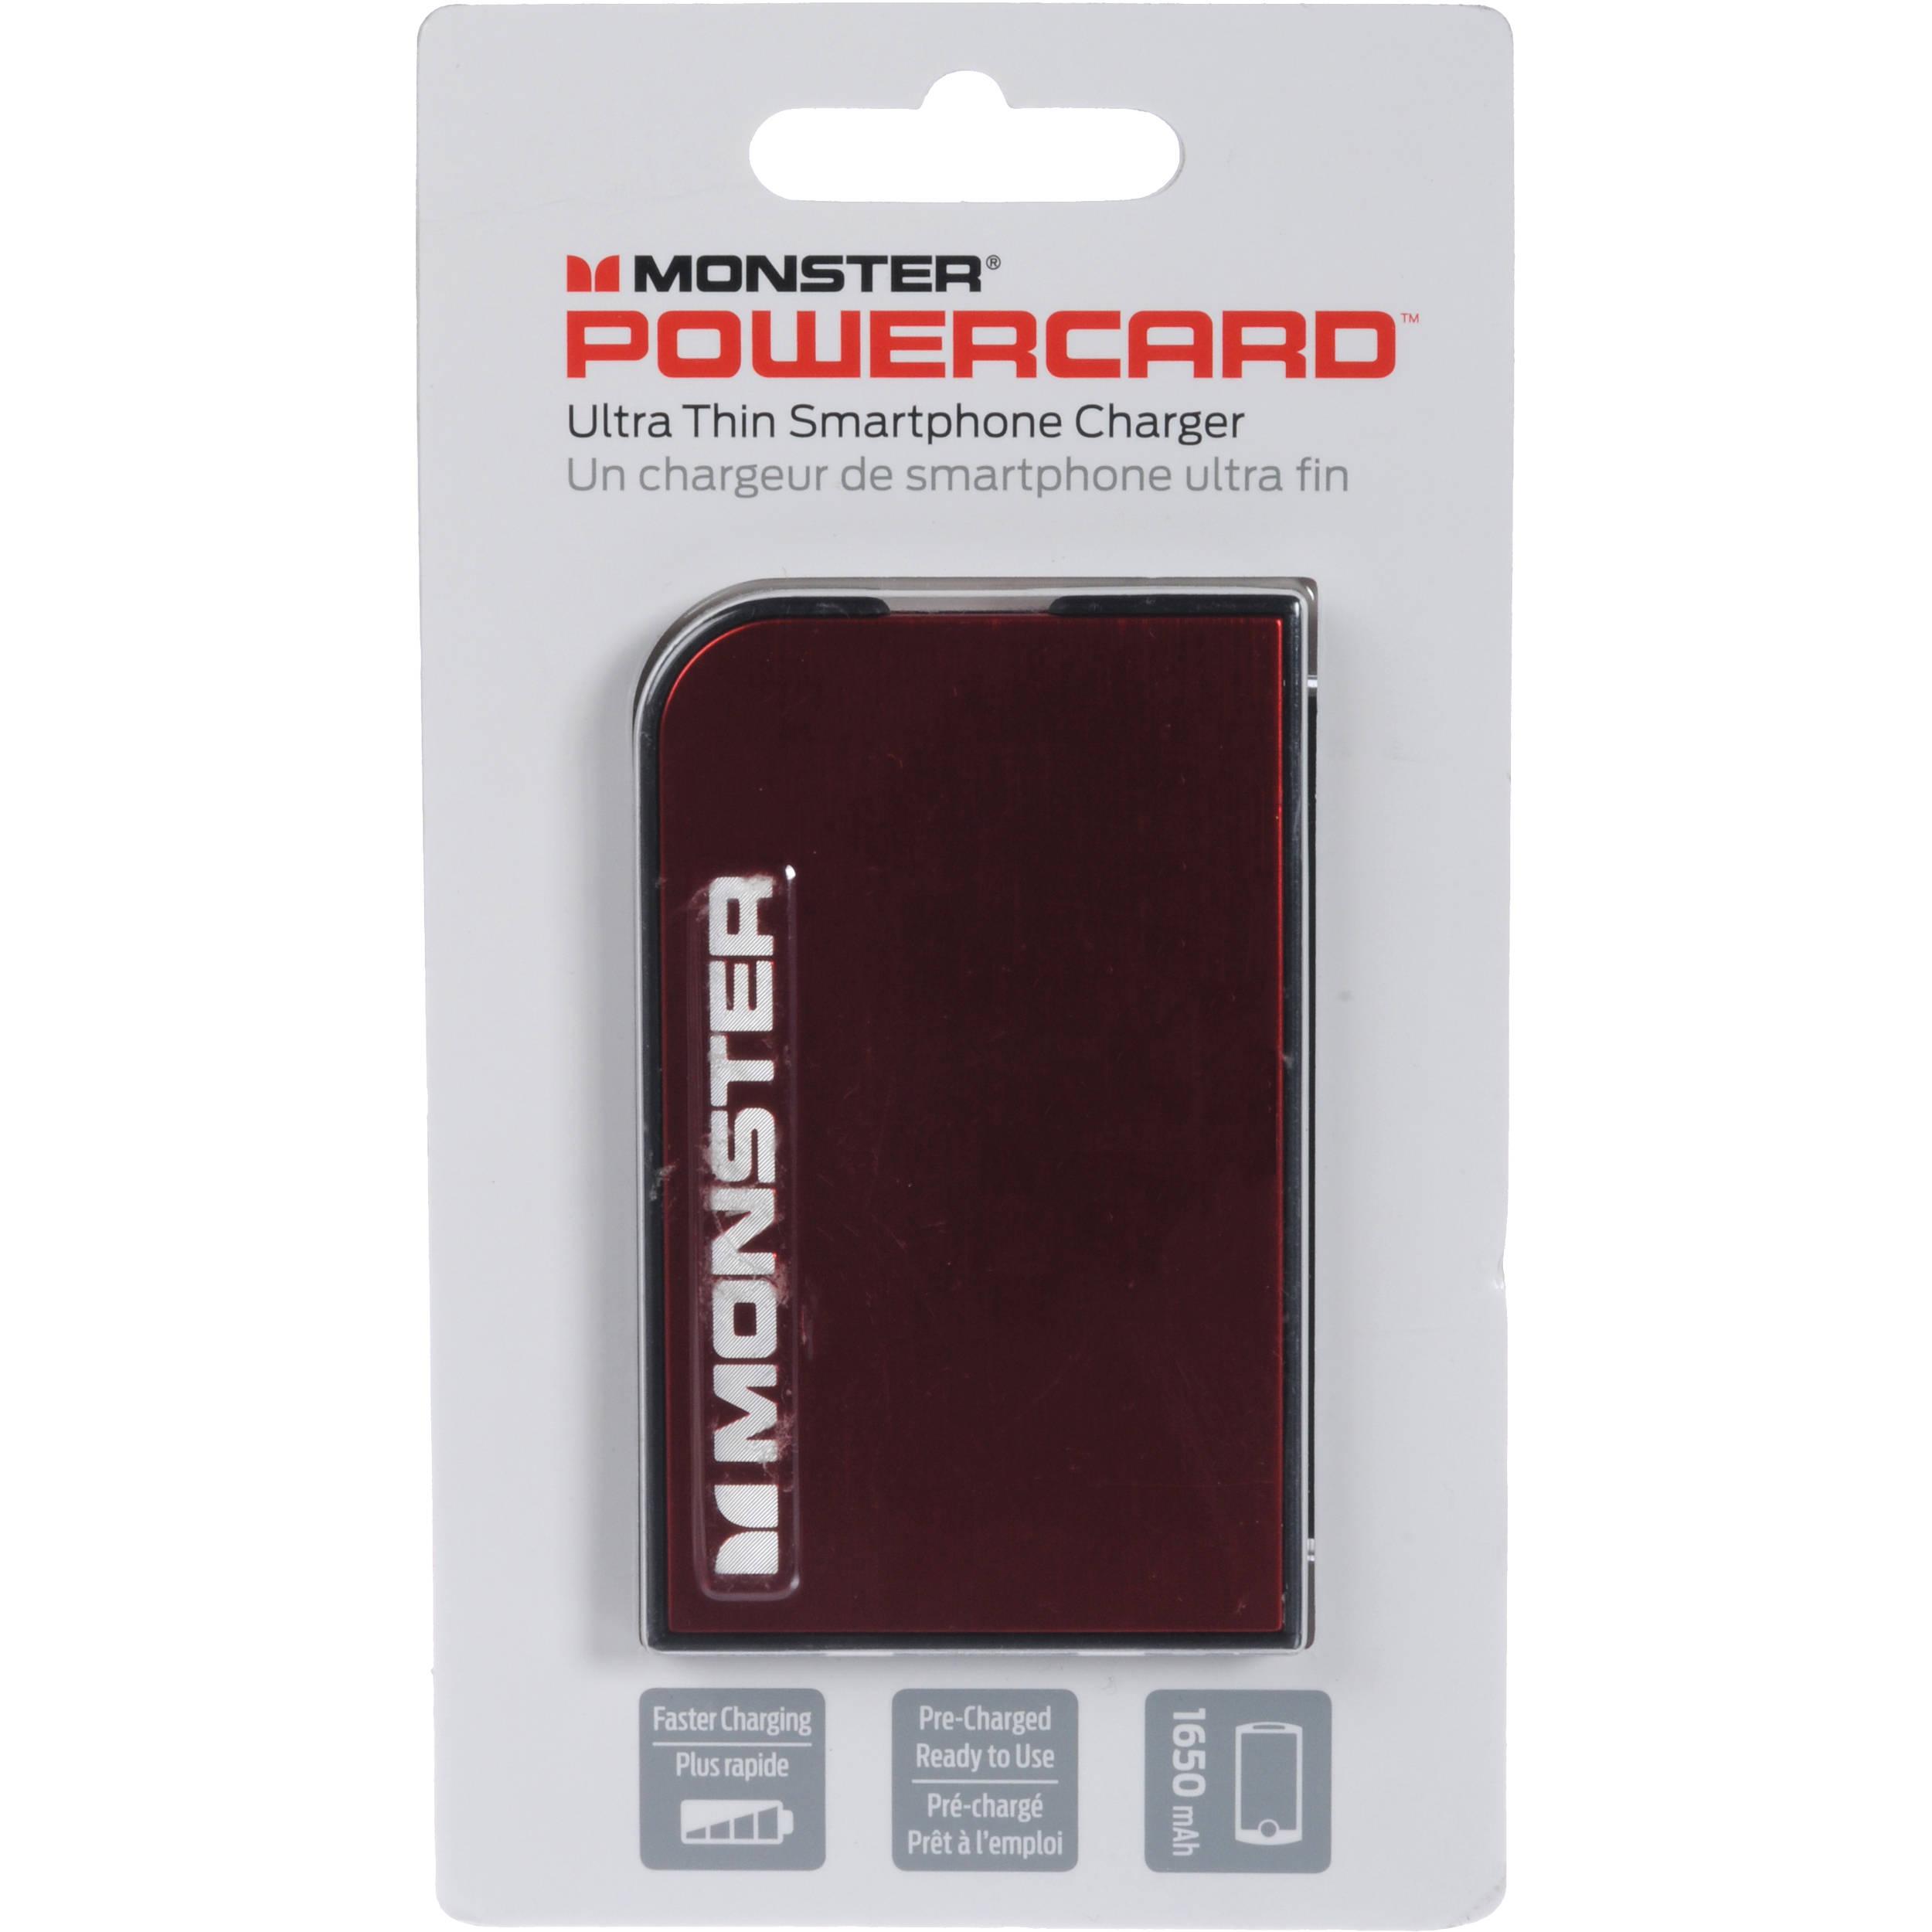 Monster Powercard Portable Battery Cherry Red 133333 00 B Amp H